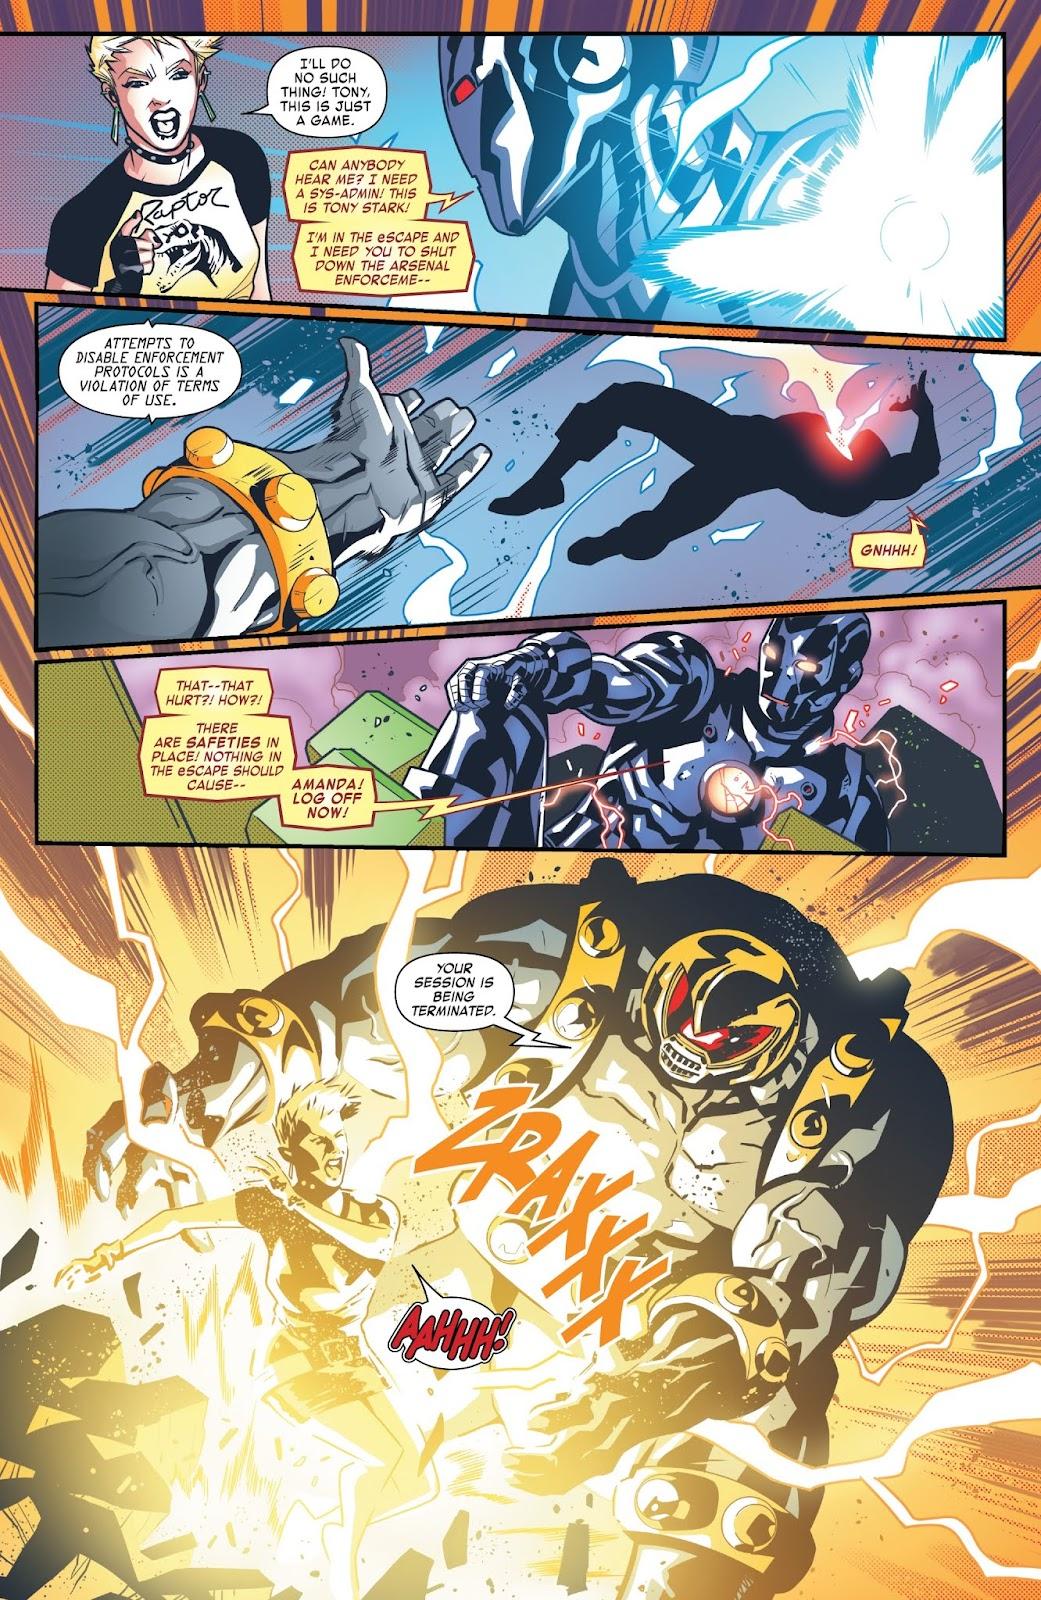 Read online Tony Stark: Iron Man comic -  Issue #6 - 19